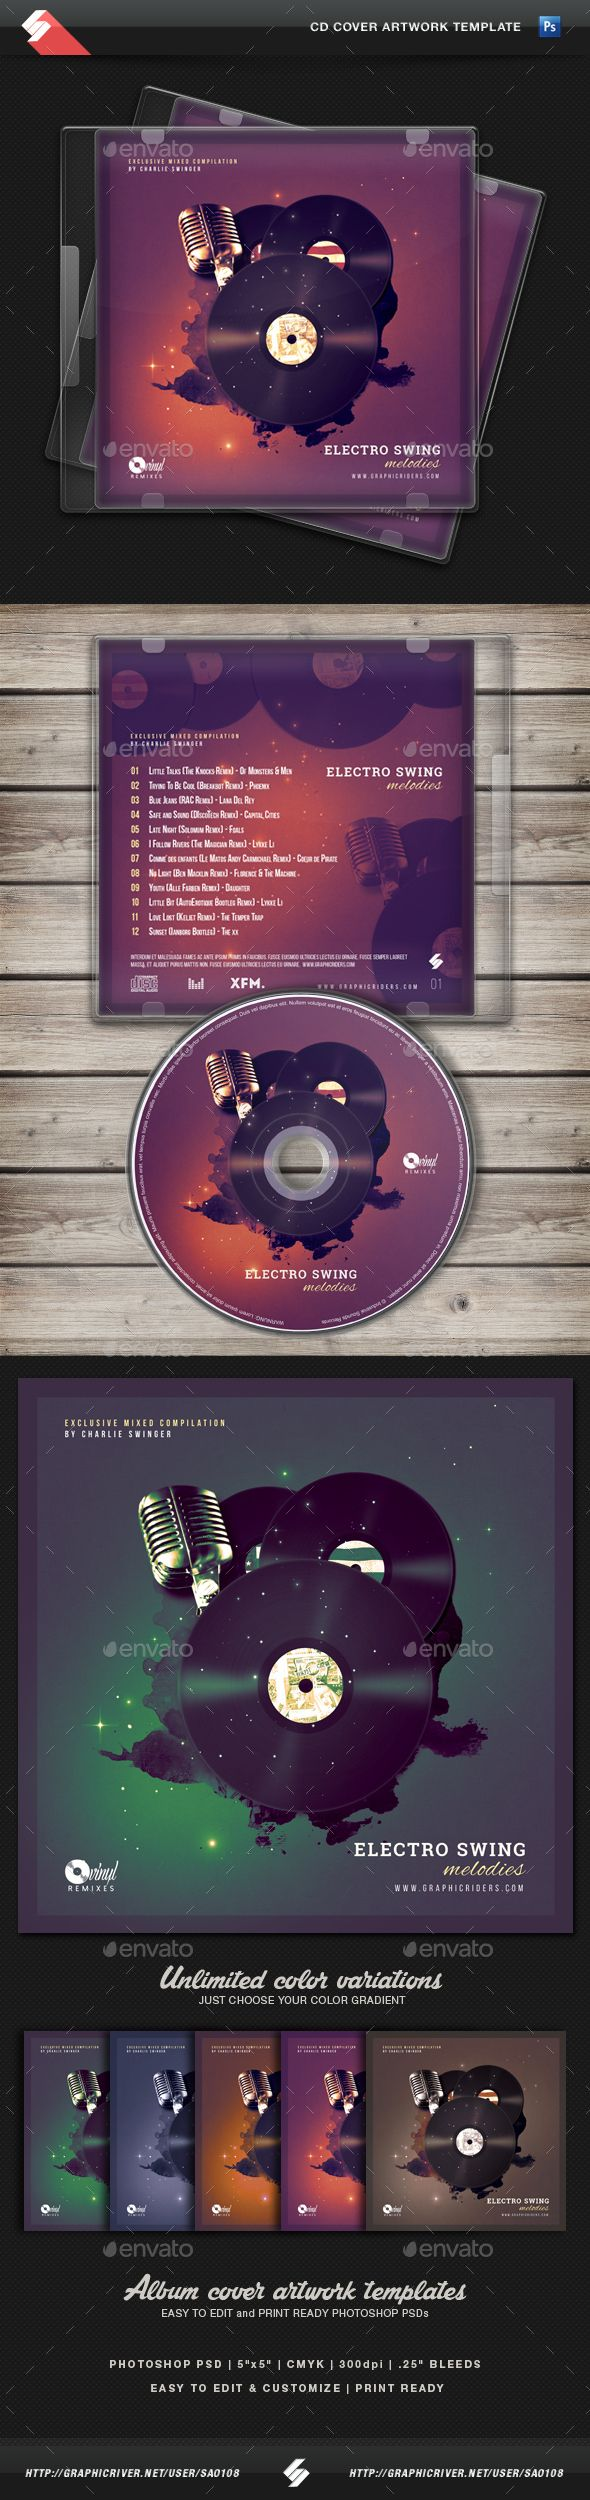 Electro Swing CD Cover Artwork Template   Pinterest